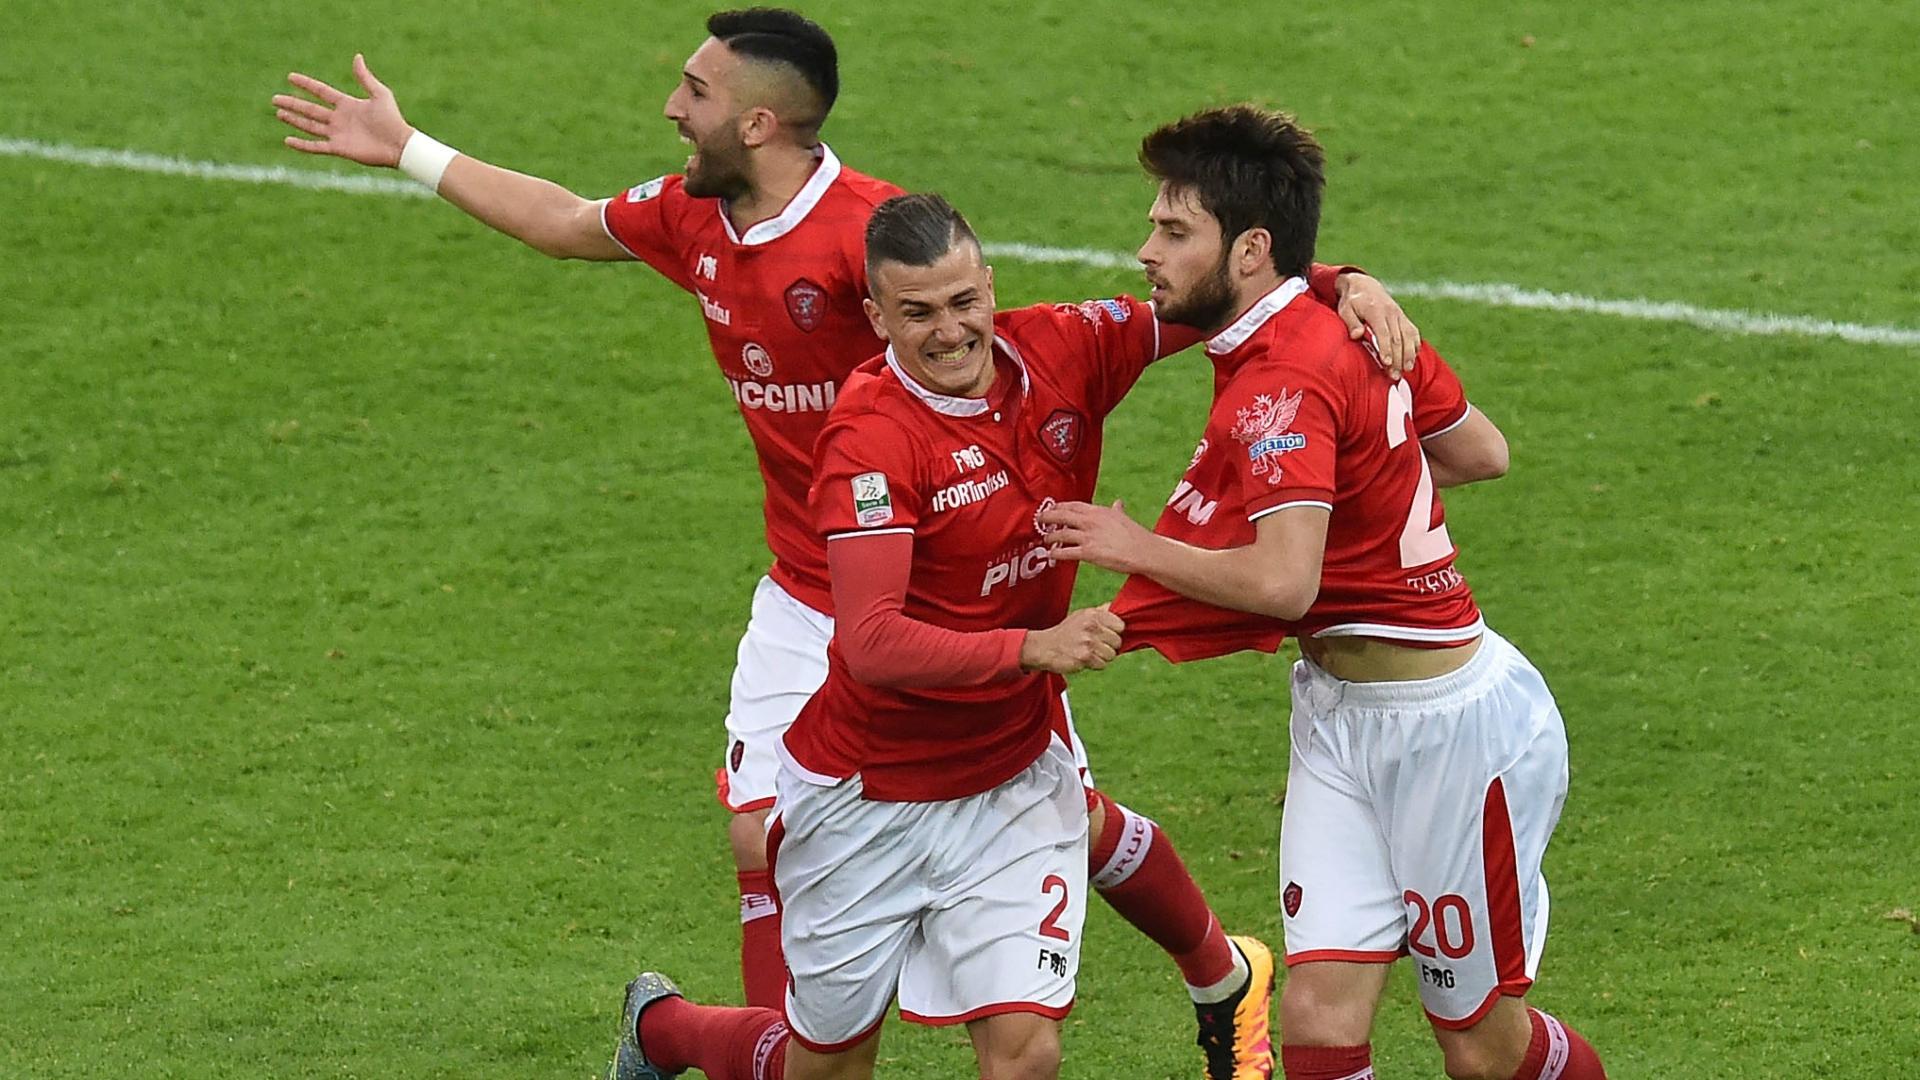 Cesena-Perugia 1-1: Guberti-Ligi, un punto a testa per Drago e Bucchi